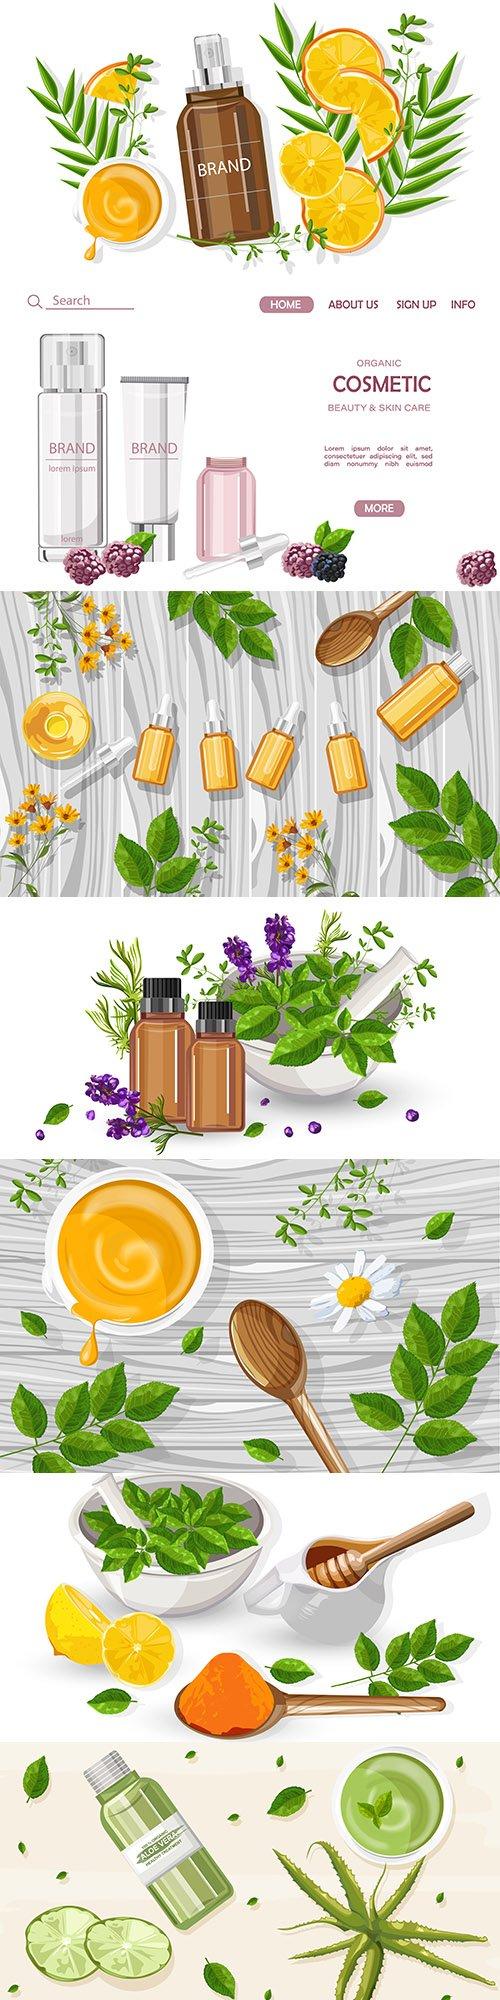 Cosmetics and facial skin care design composition